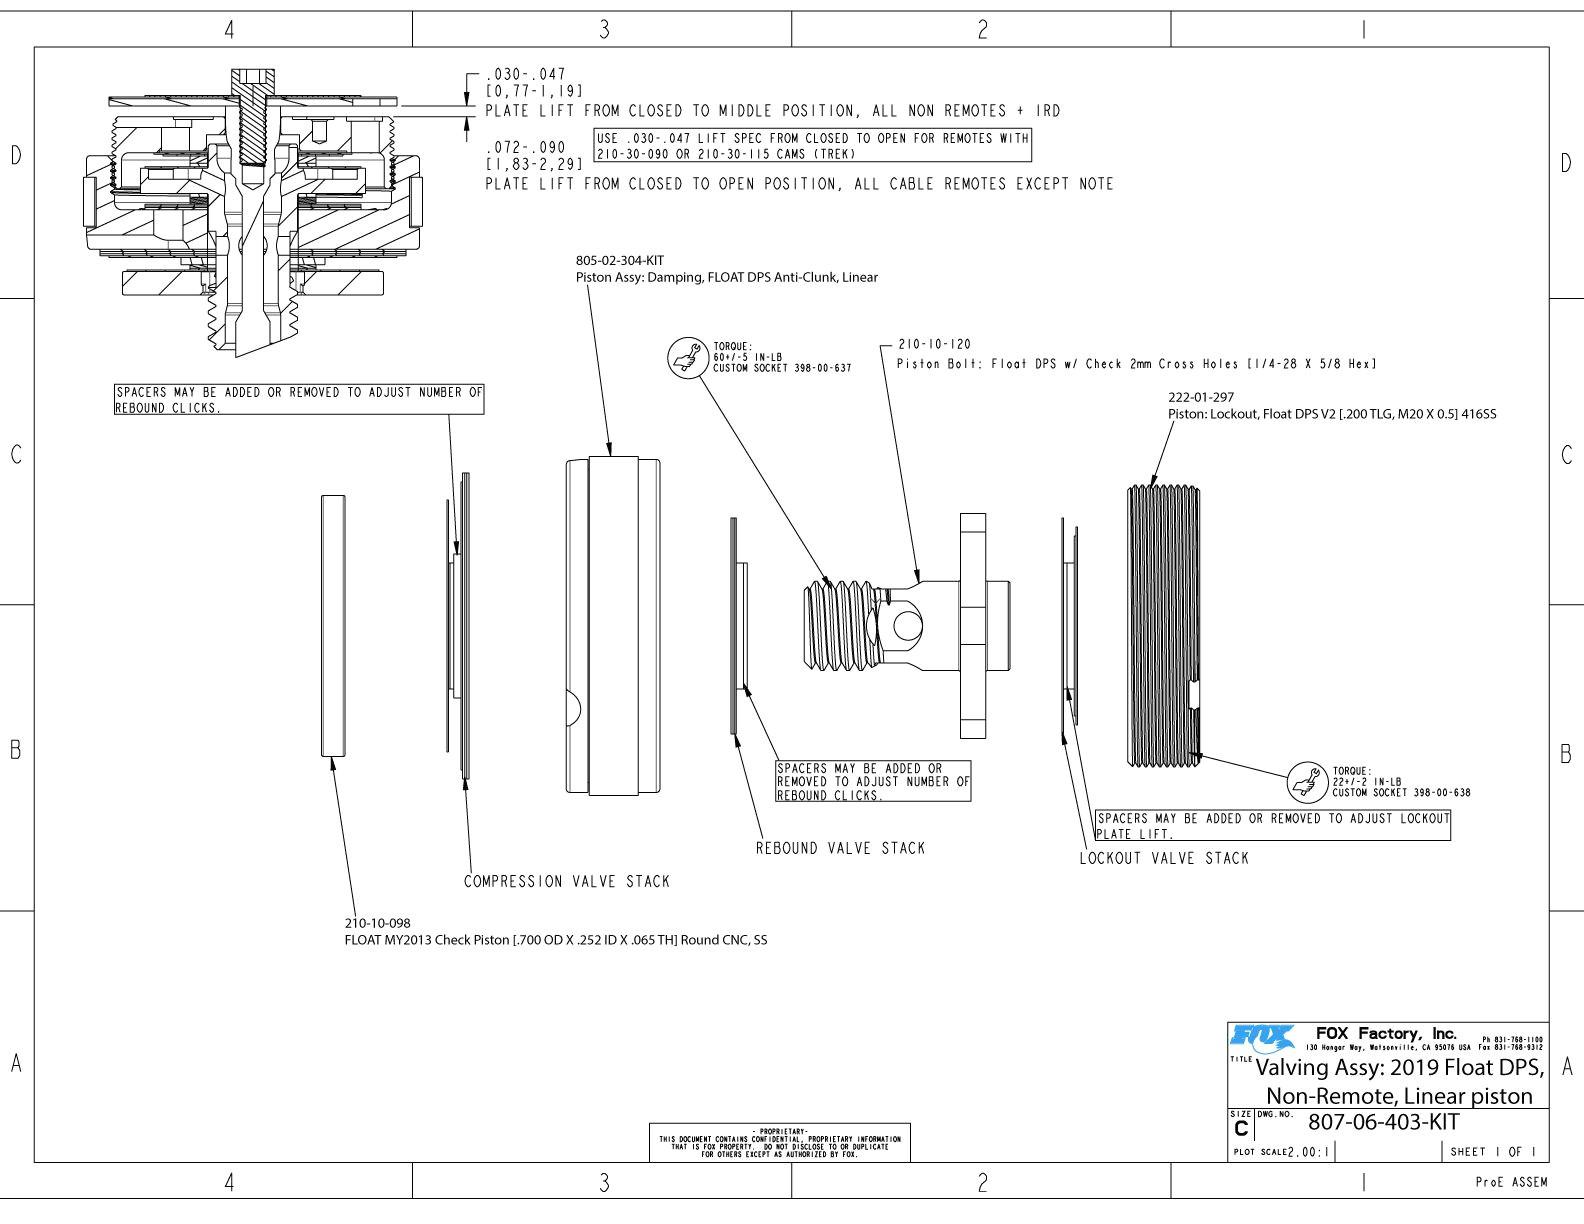 807 06 403 kit valving assy 2019 float dps non remote linear piston